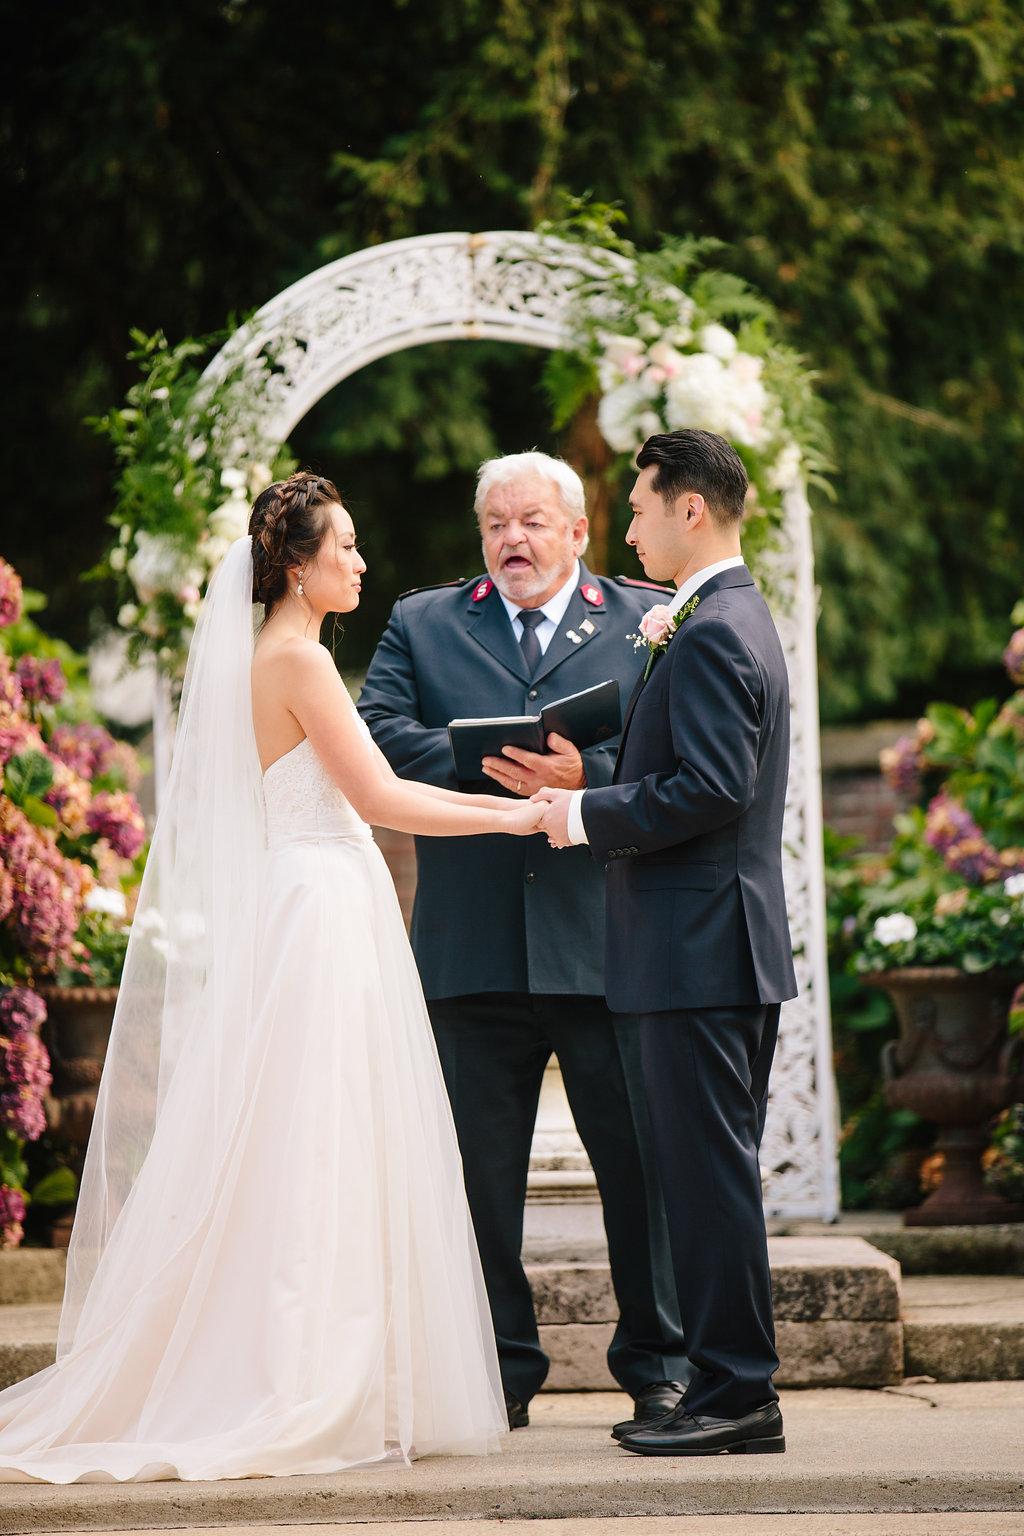 Kellylemonphotography_lucy+kento_weddingpreviews-30.jpg